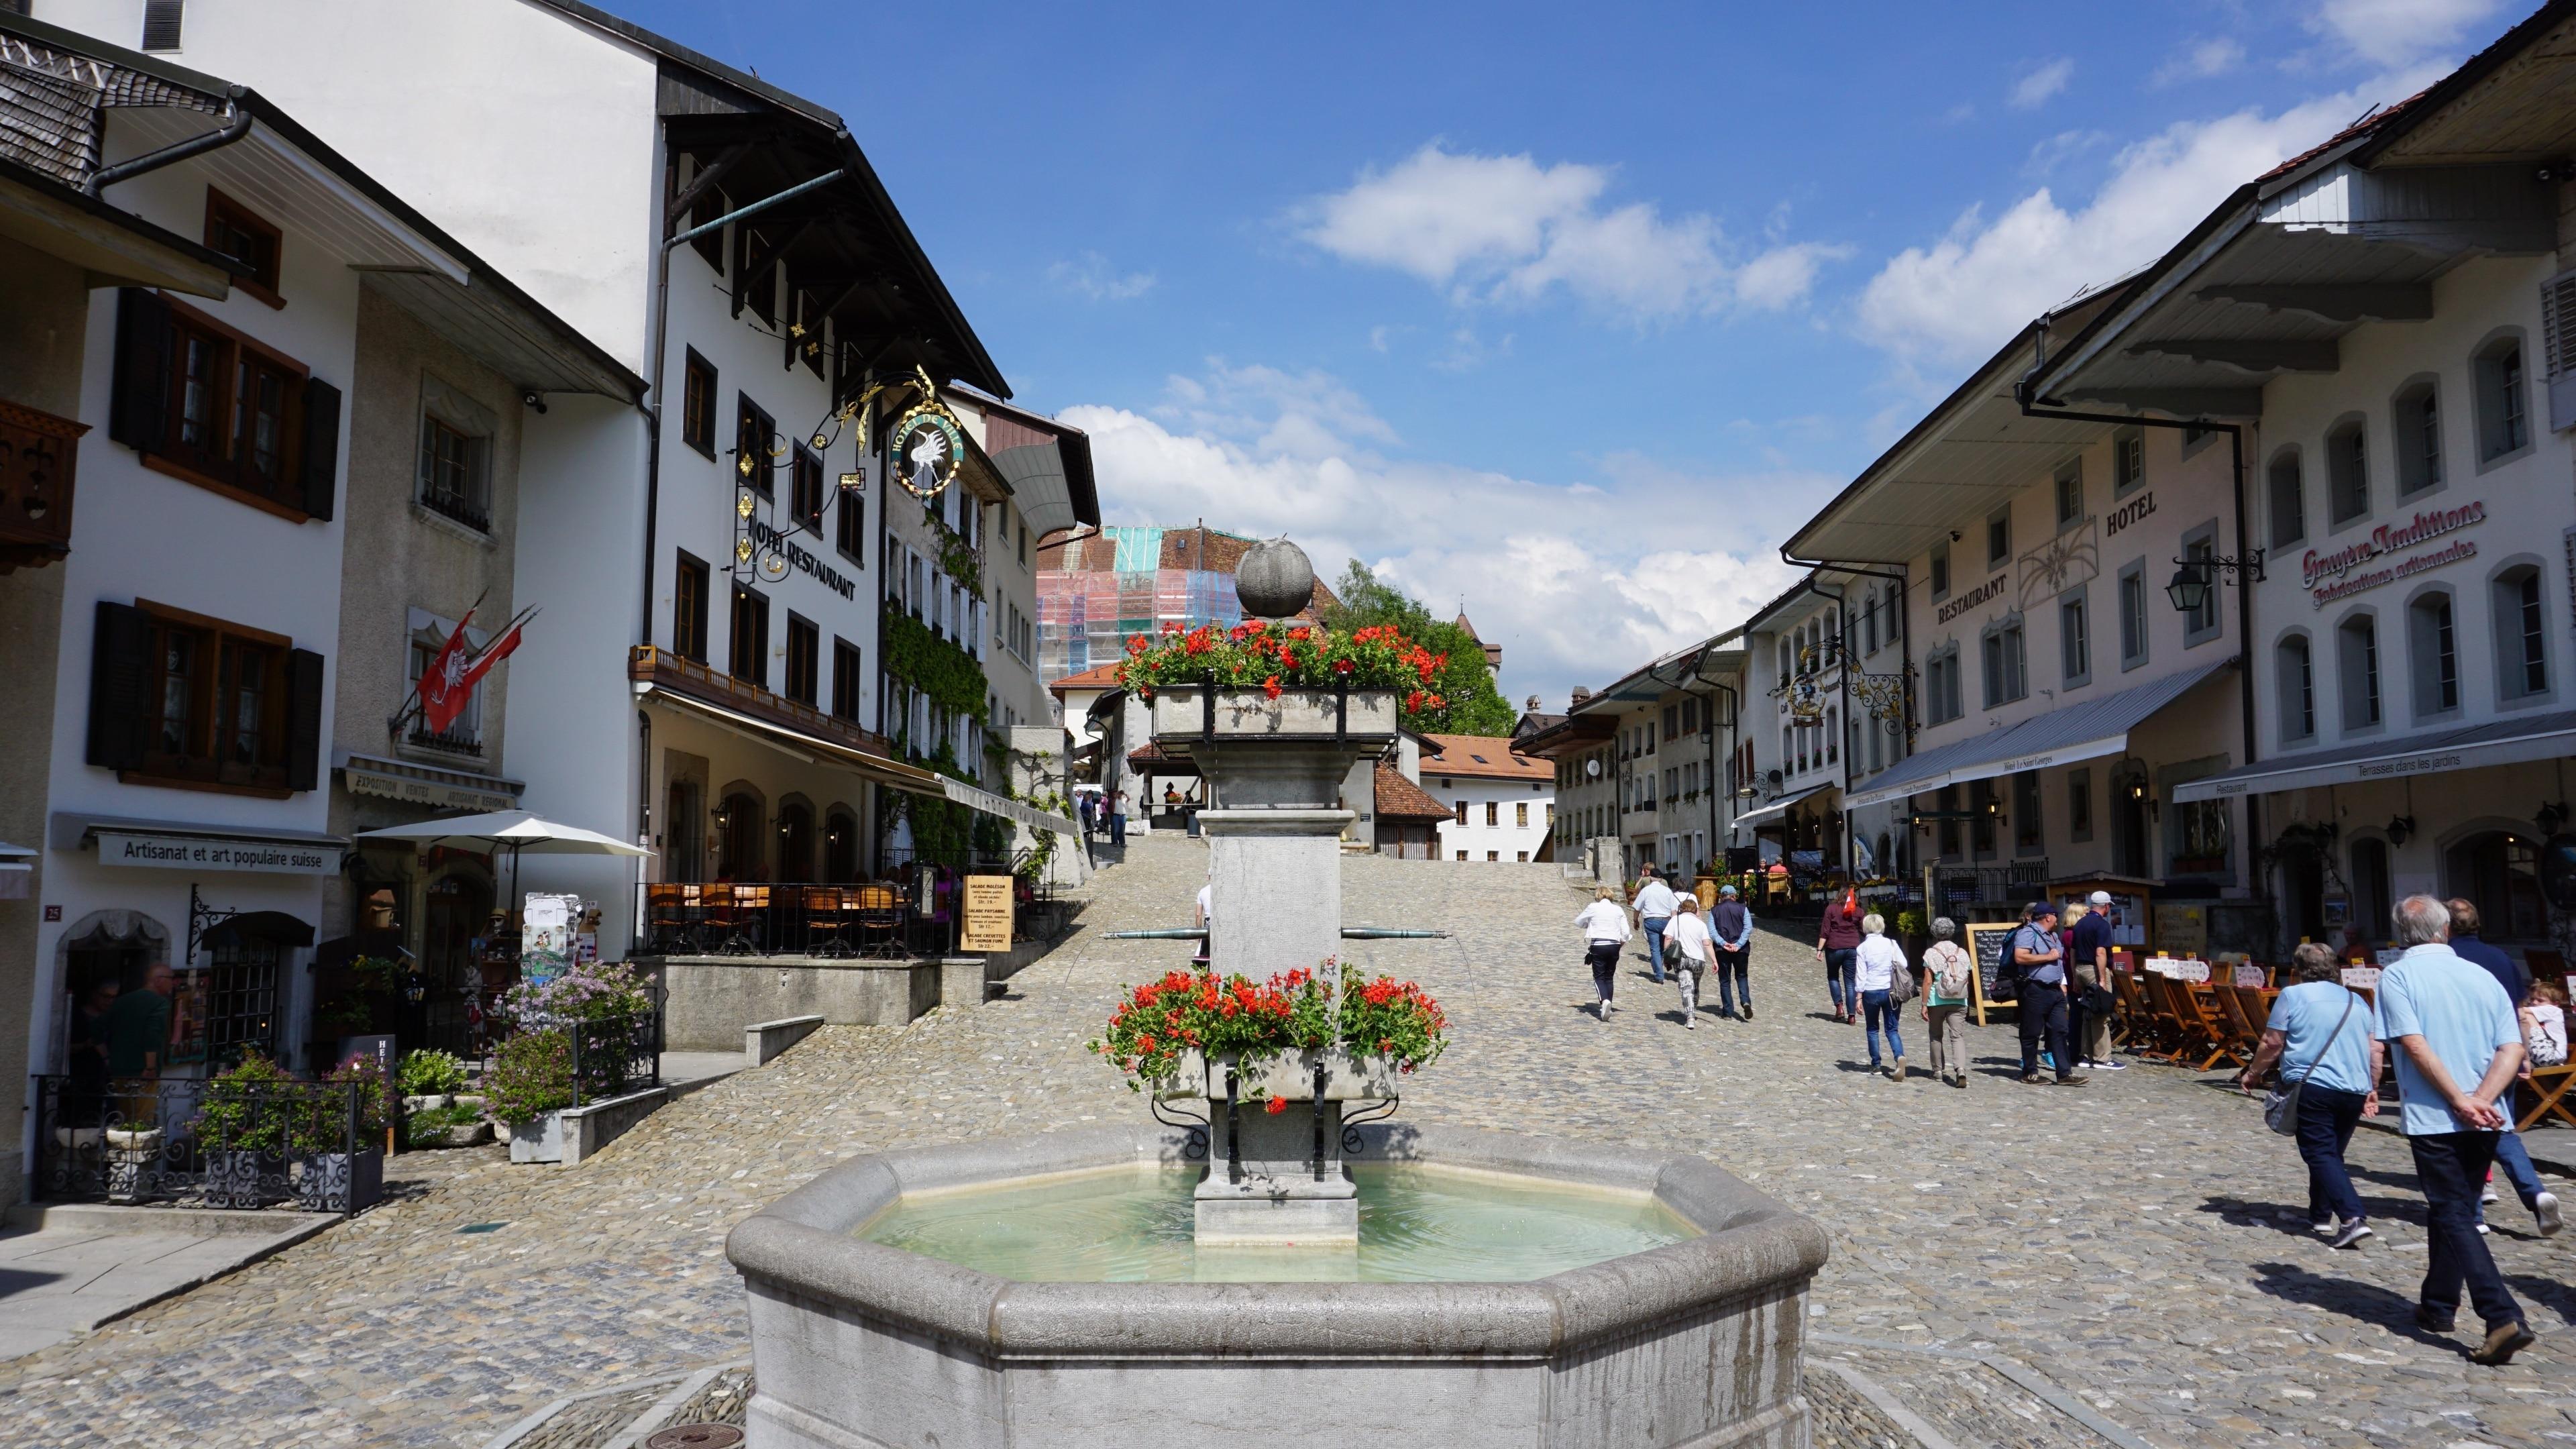 La Gruyère, Canton of Fribourg, Switzerland